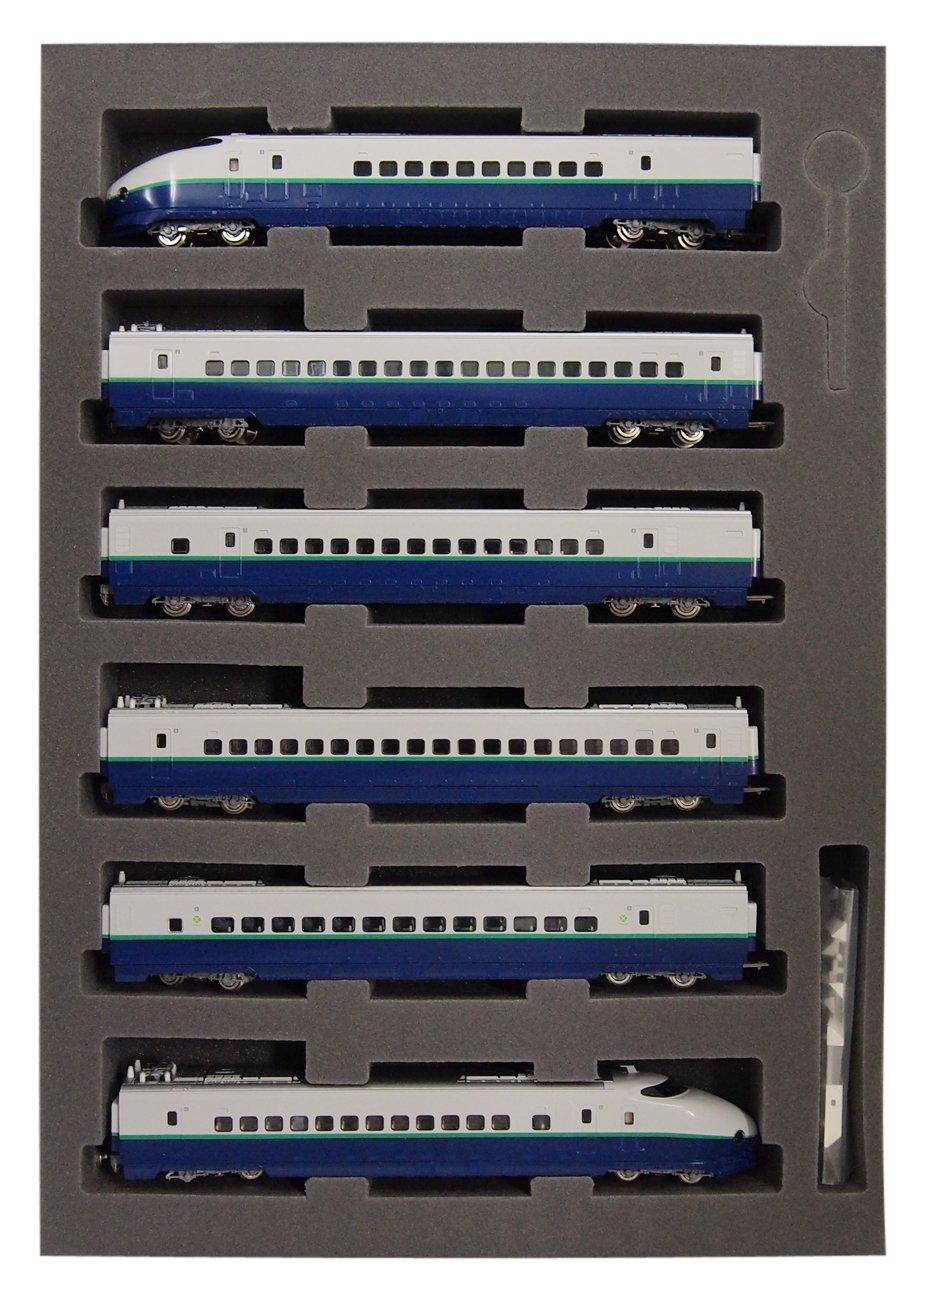 TOMIX Nゲージ 200系 東北 上越新幹線 リニューアル車 基本セット 92852 鉄道模型 電車 B008RWYXXS